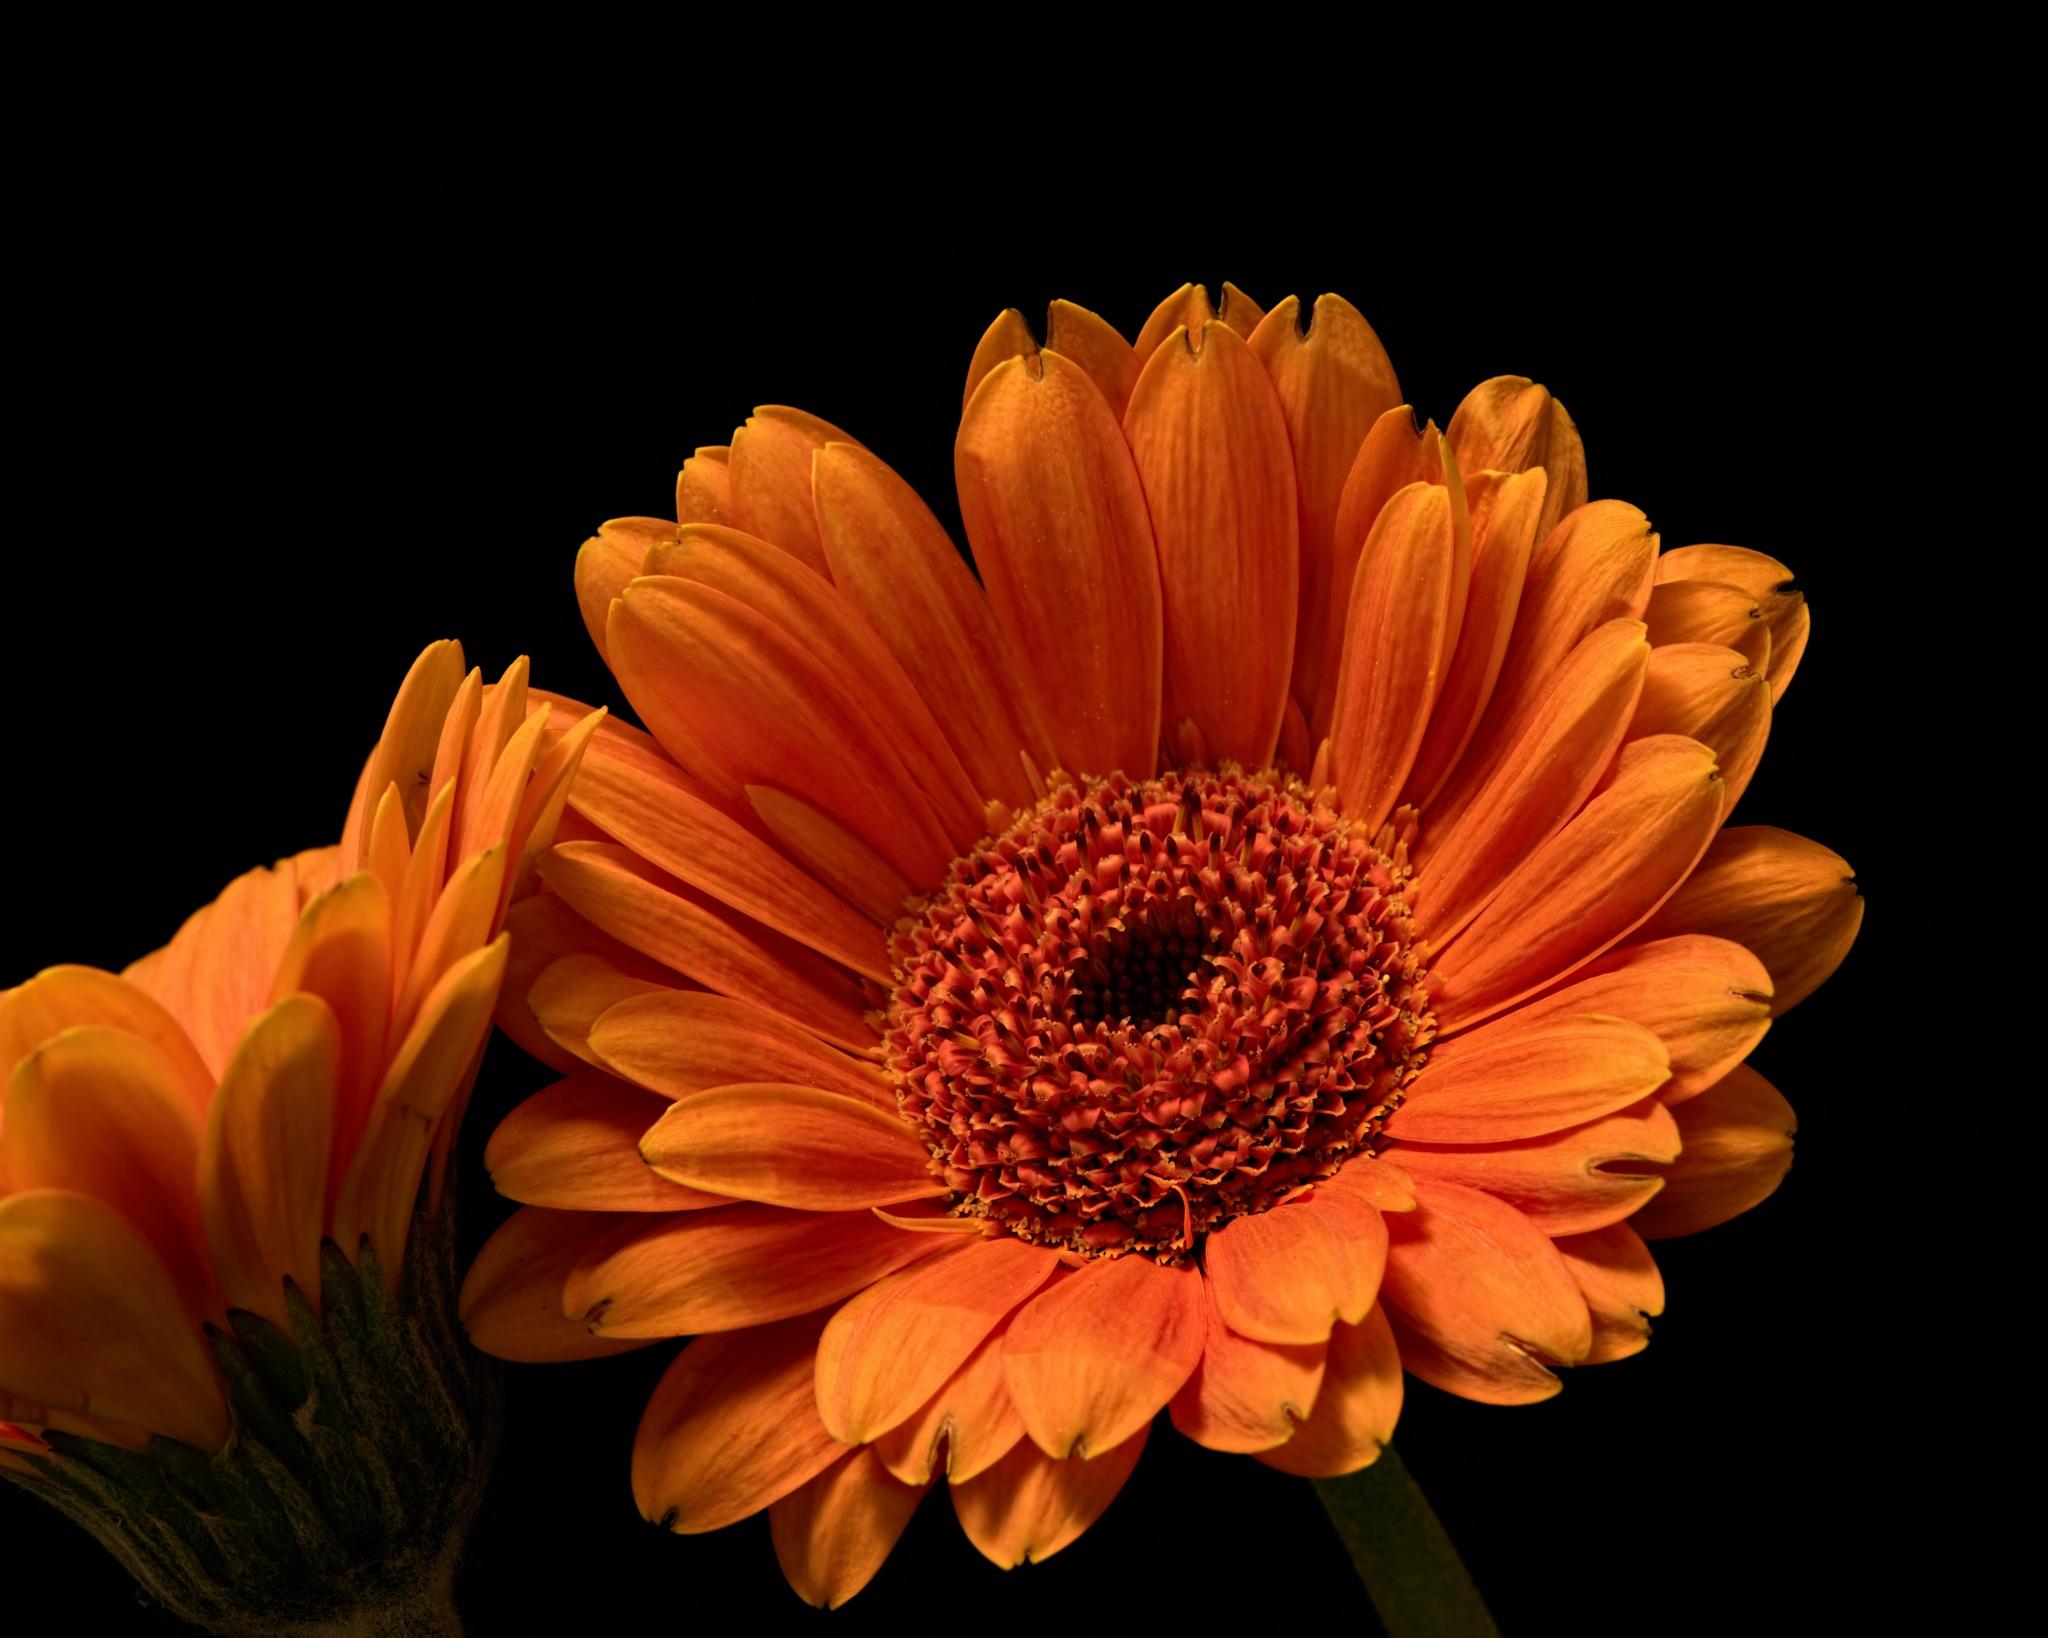 Orange Gerbera 0322 by ThomasJerger